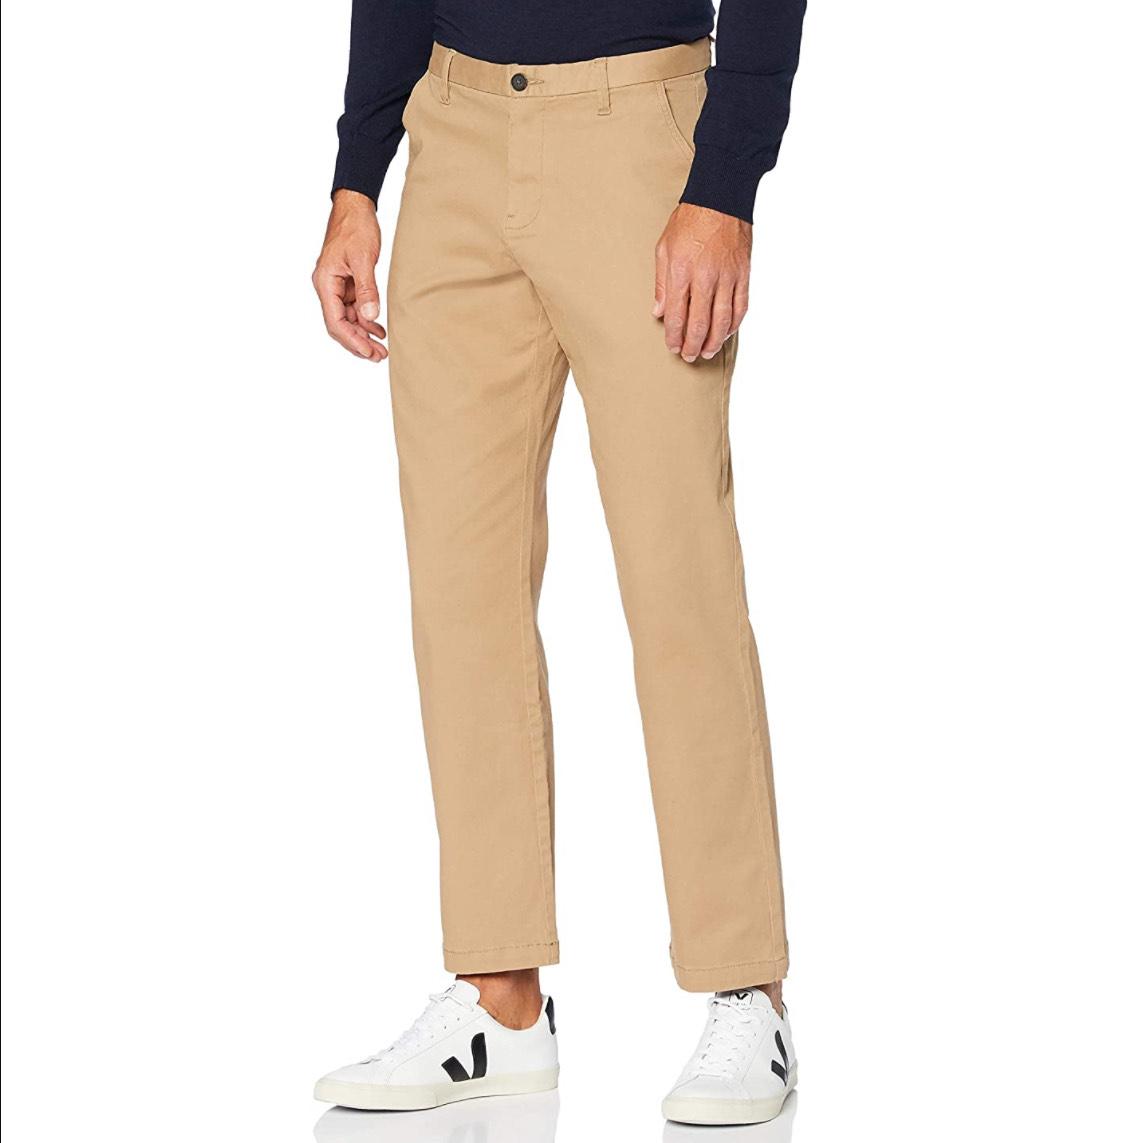 Pantalón tipo chino hombre talla 36W/32L (46)